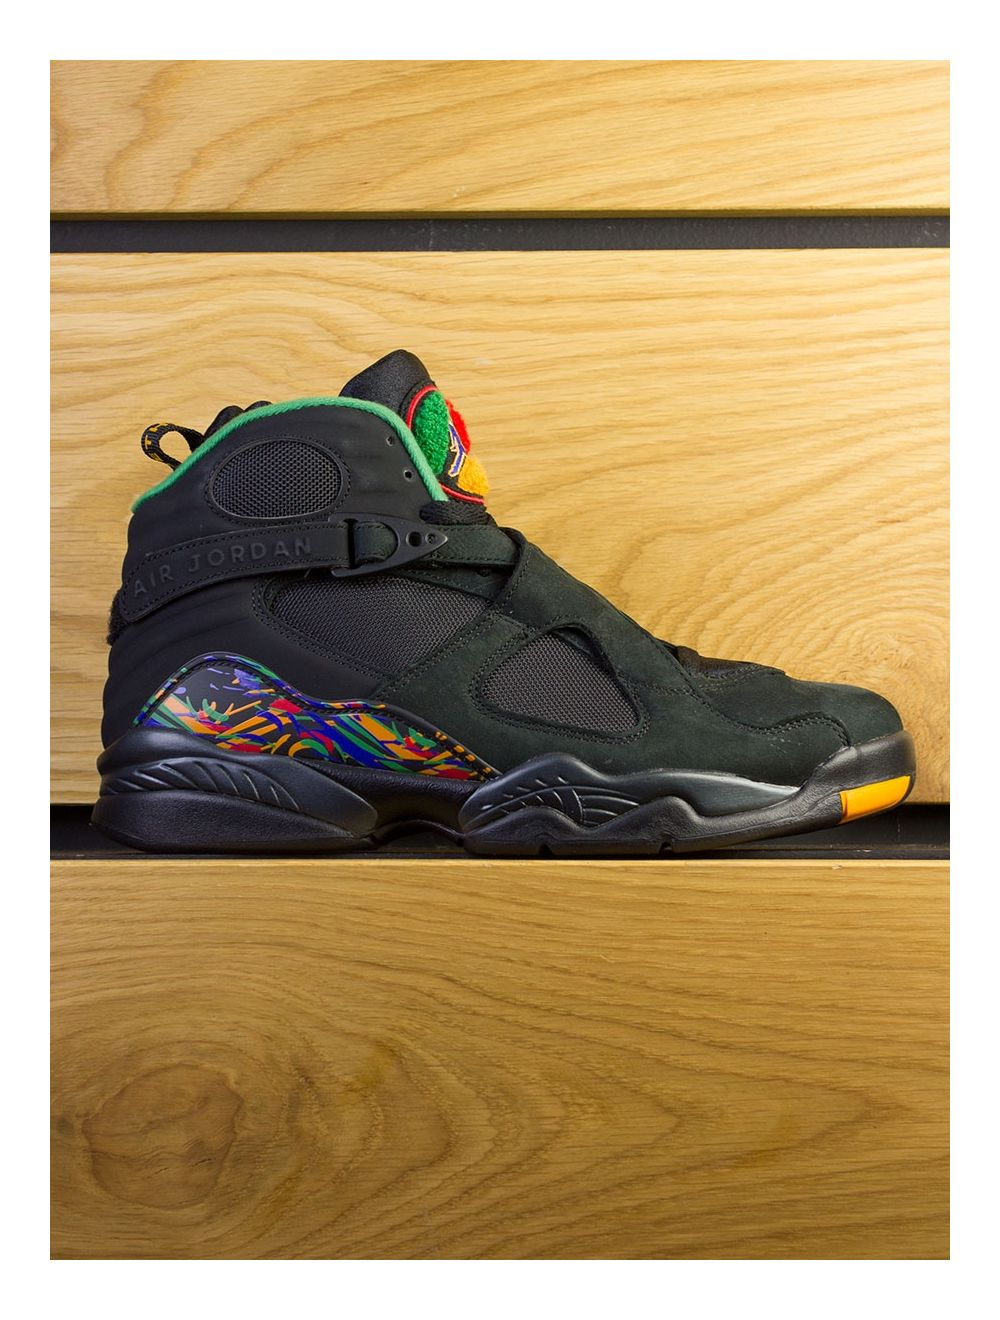 sports shoes 8443a 71a0a Nike Air Jordan 8 Retro Tinker